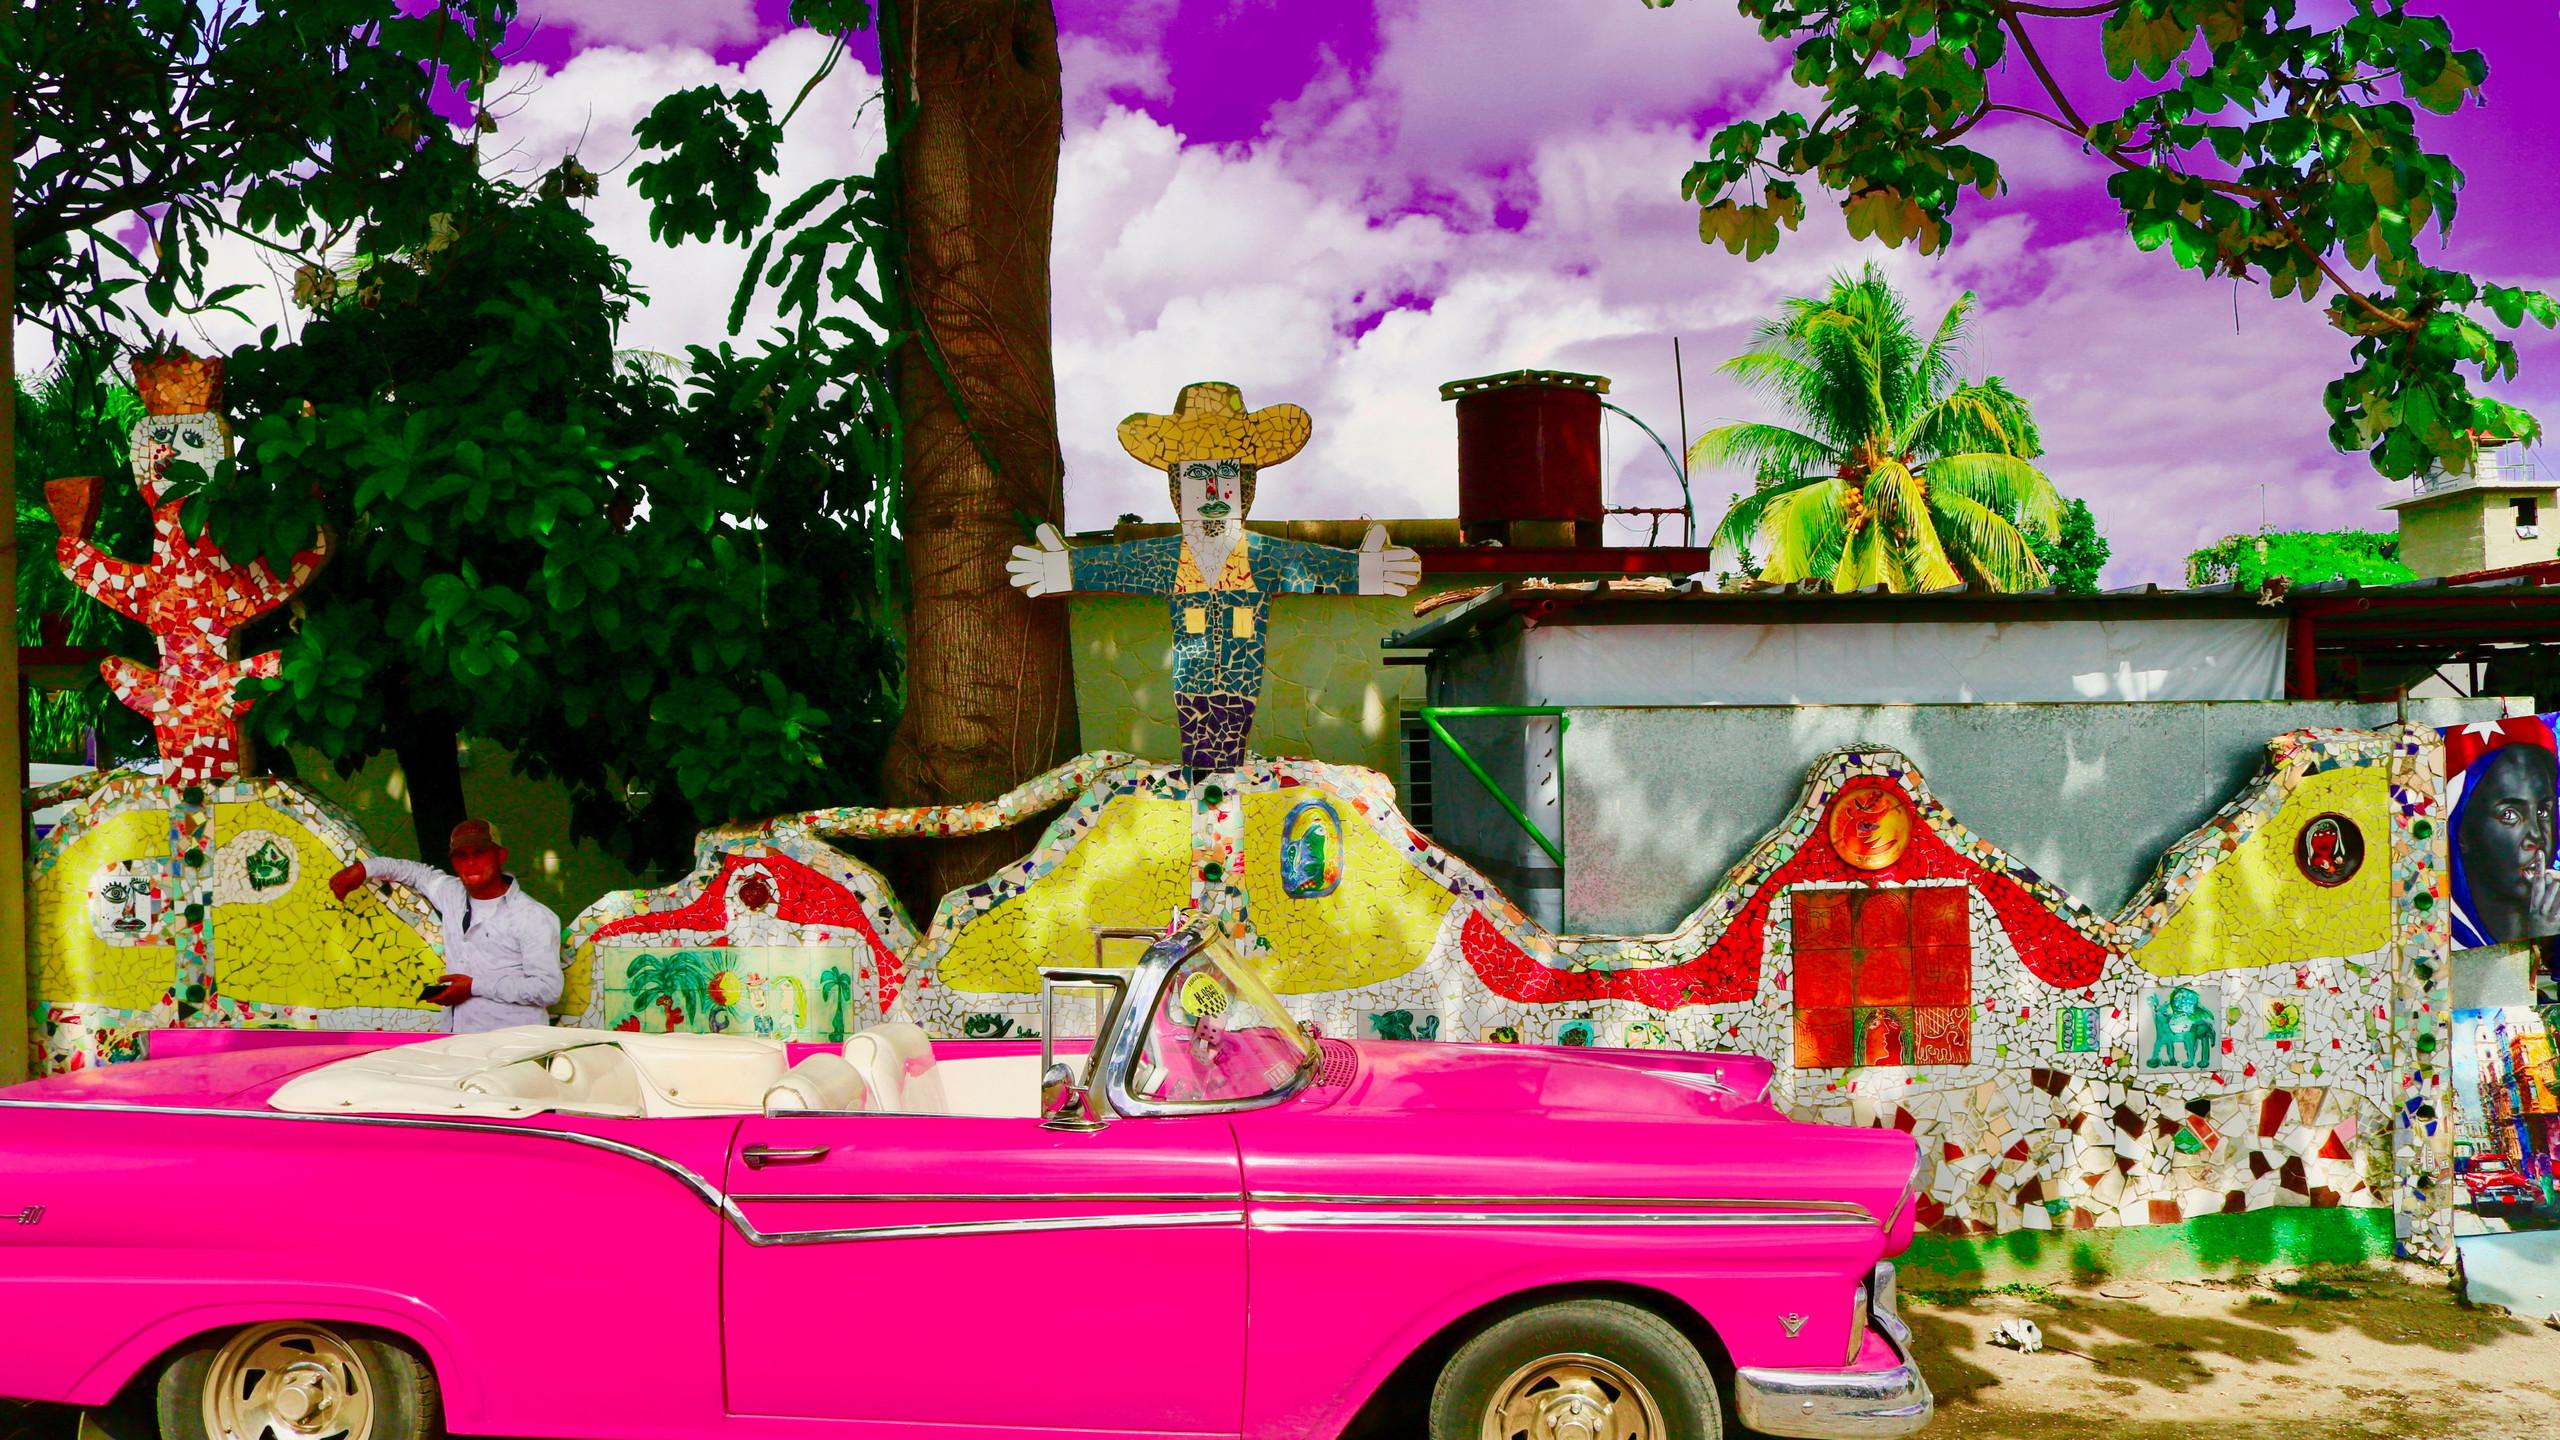 Hot pink Cadillac in front of Fusterlandia in Havana.